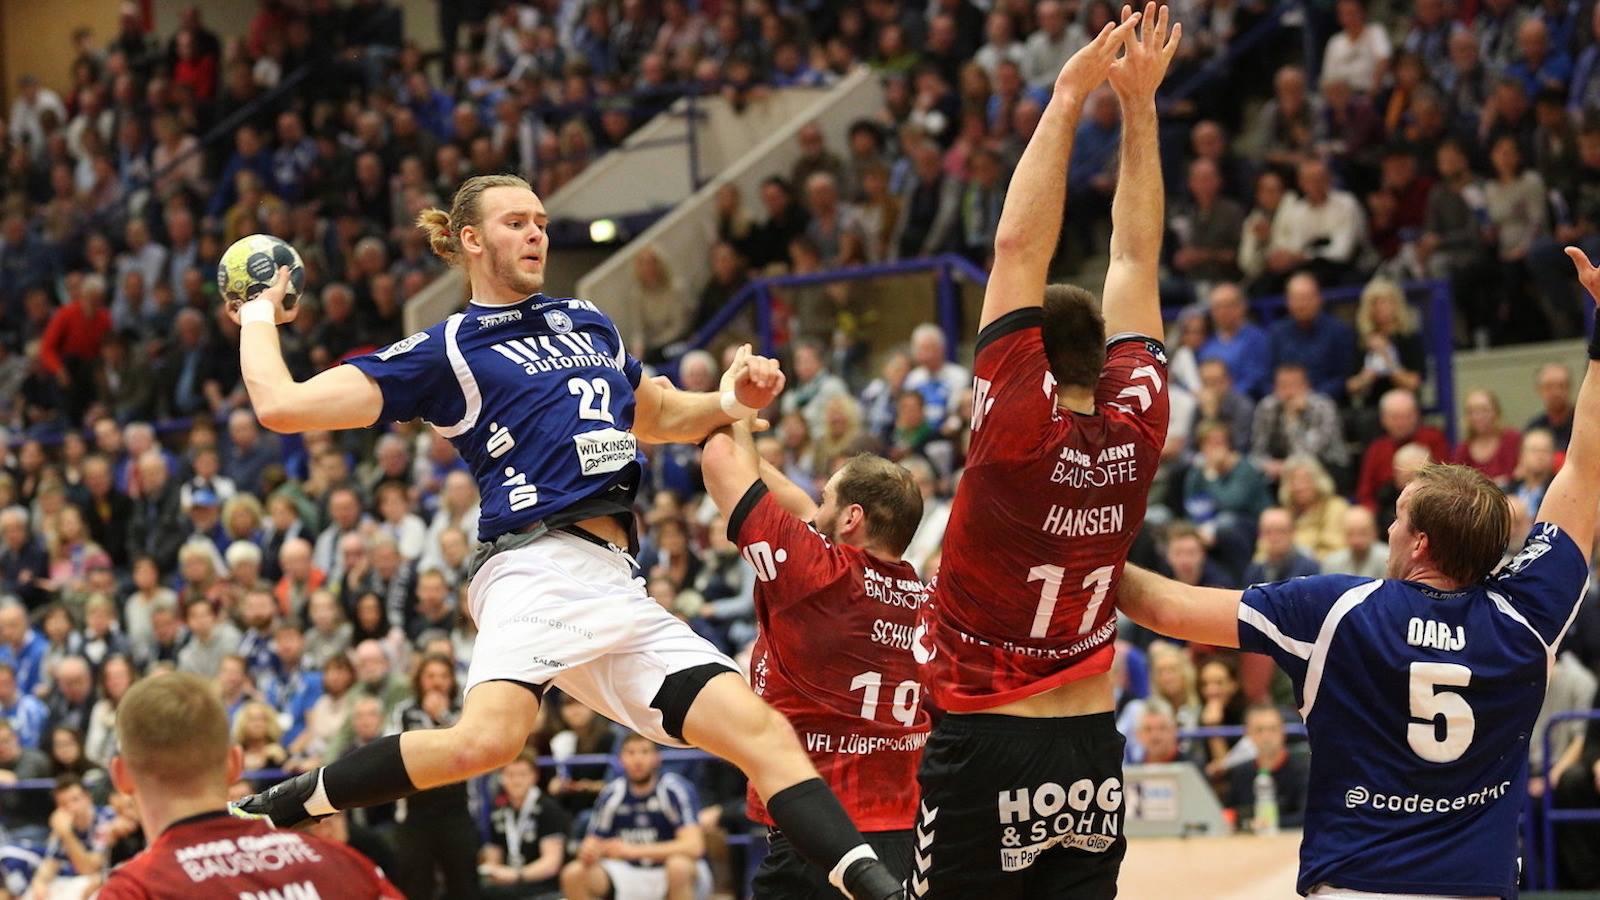 Bergischer Handballclub (BHC)